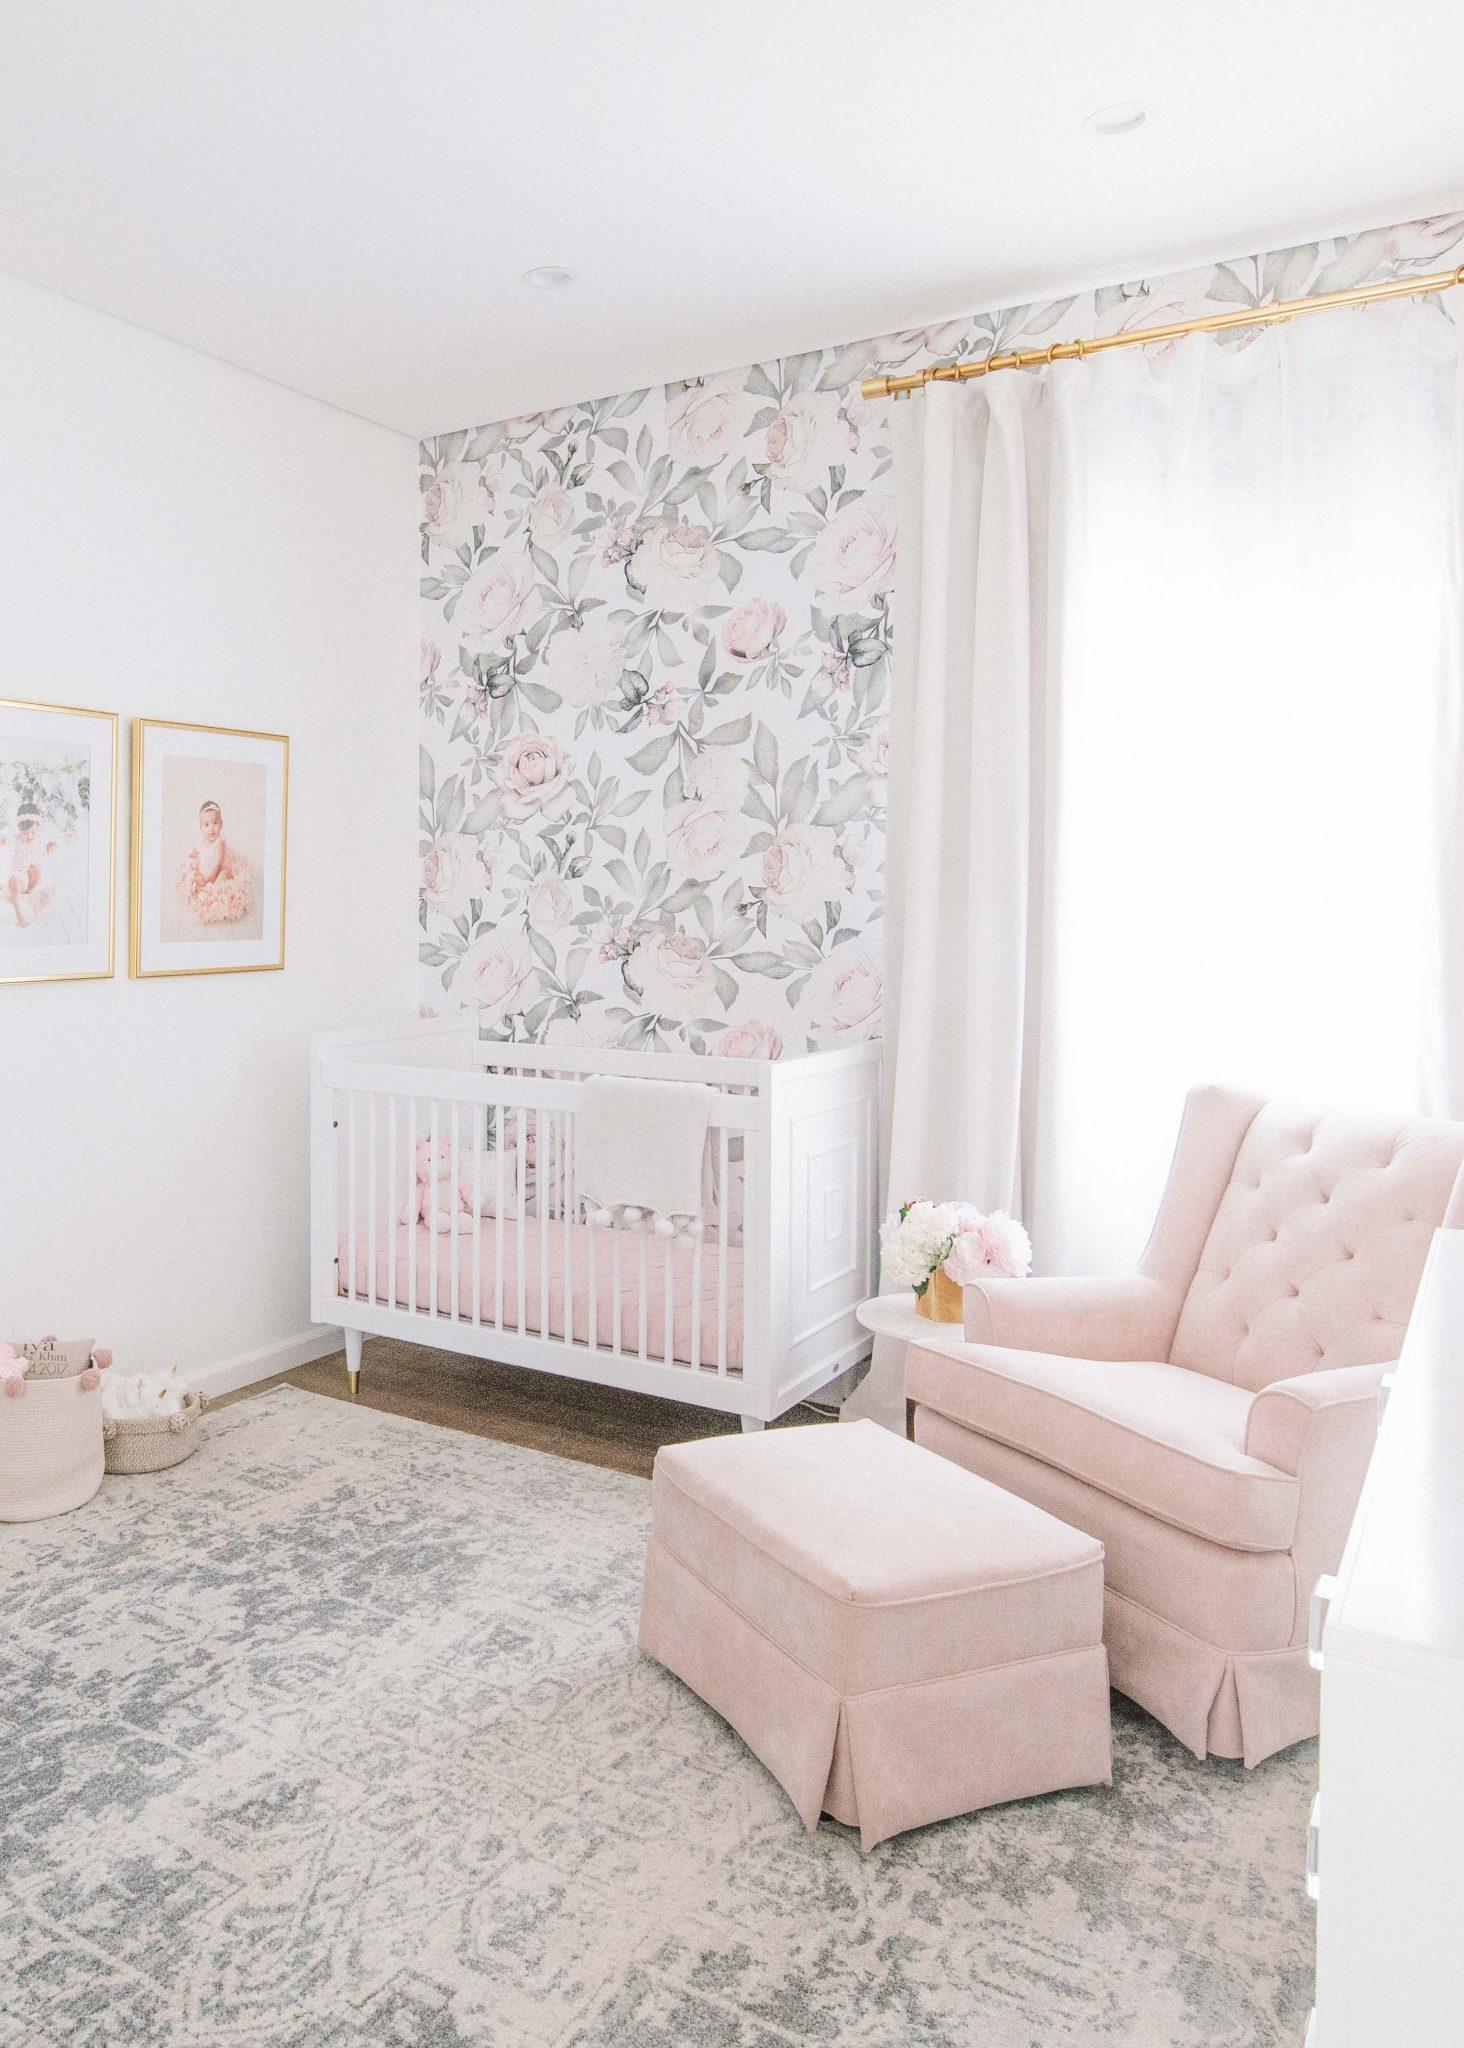 Blush and gold nursery